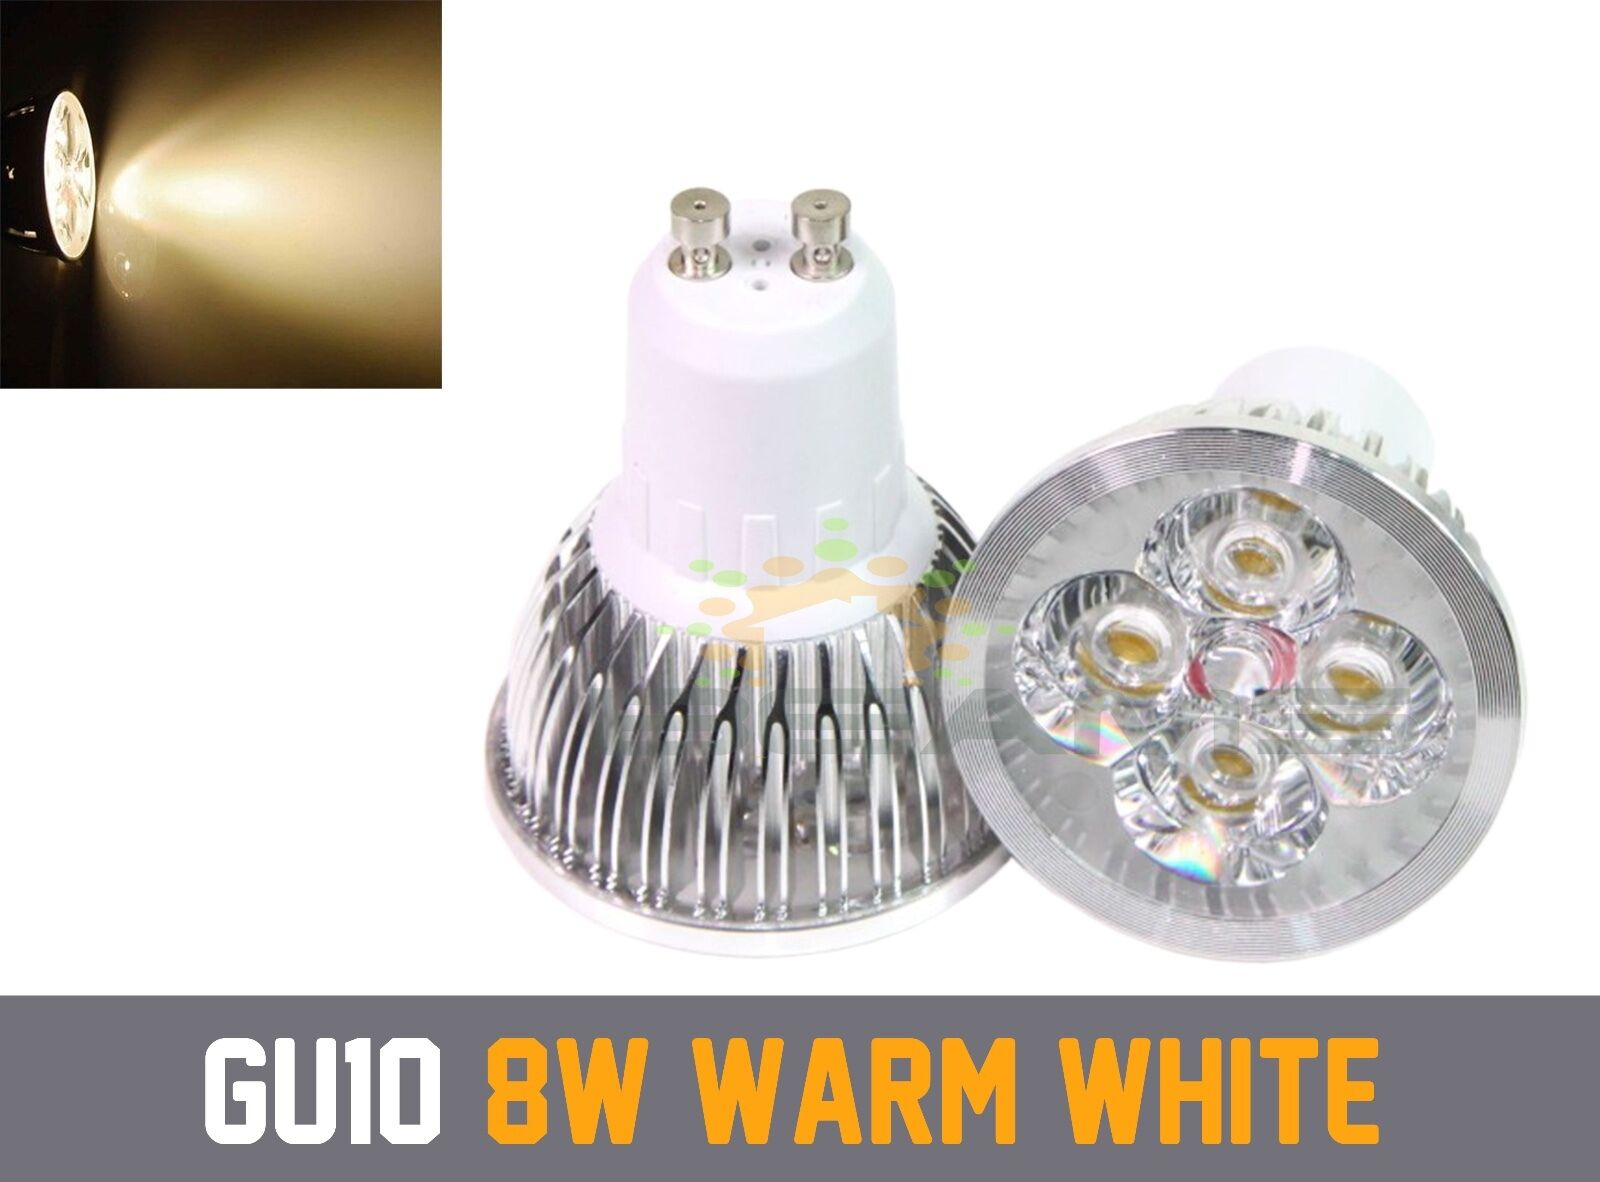 Premium Premium Premium Dimmable GU10 6 W 8 W 9 W Bianco Caldo Frossodo Bianco LED Lampadina Riflettore 6540cf